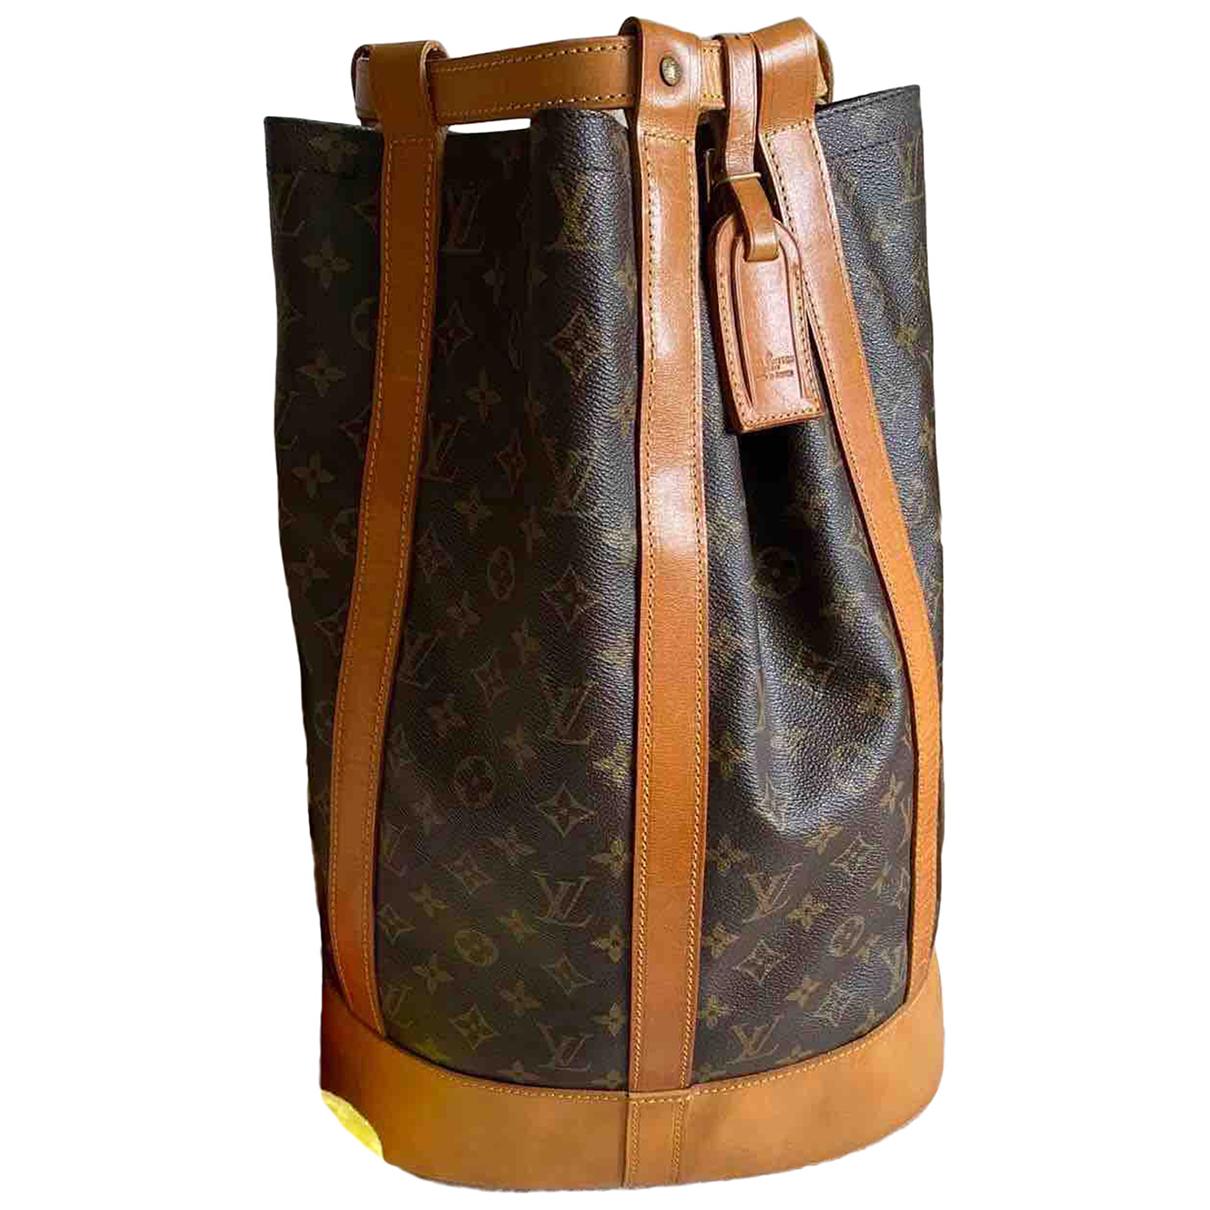 Louis Vuitton - Sac a dos Randonnee pour femme en toile - marron